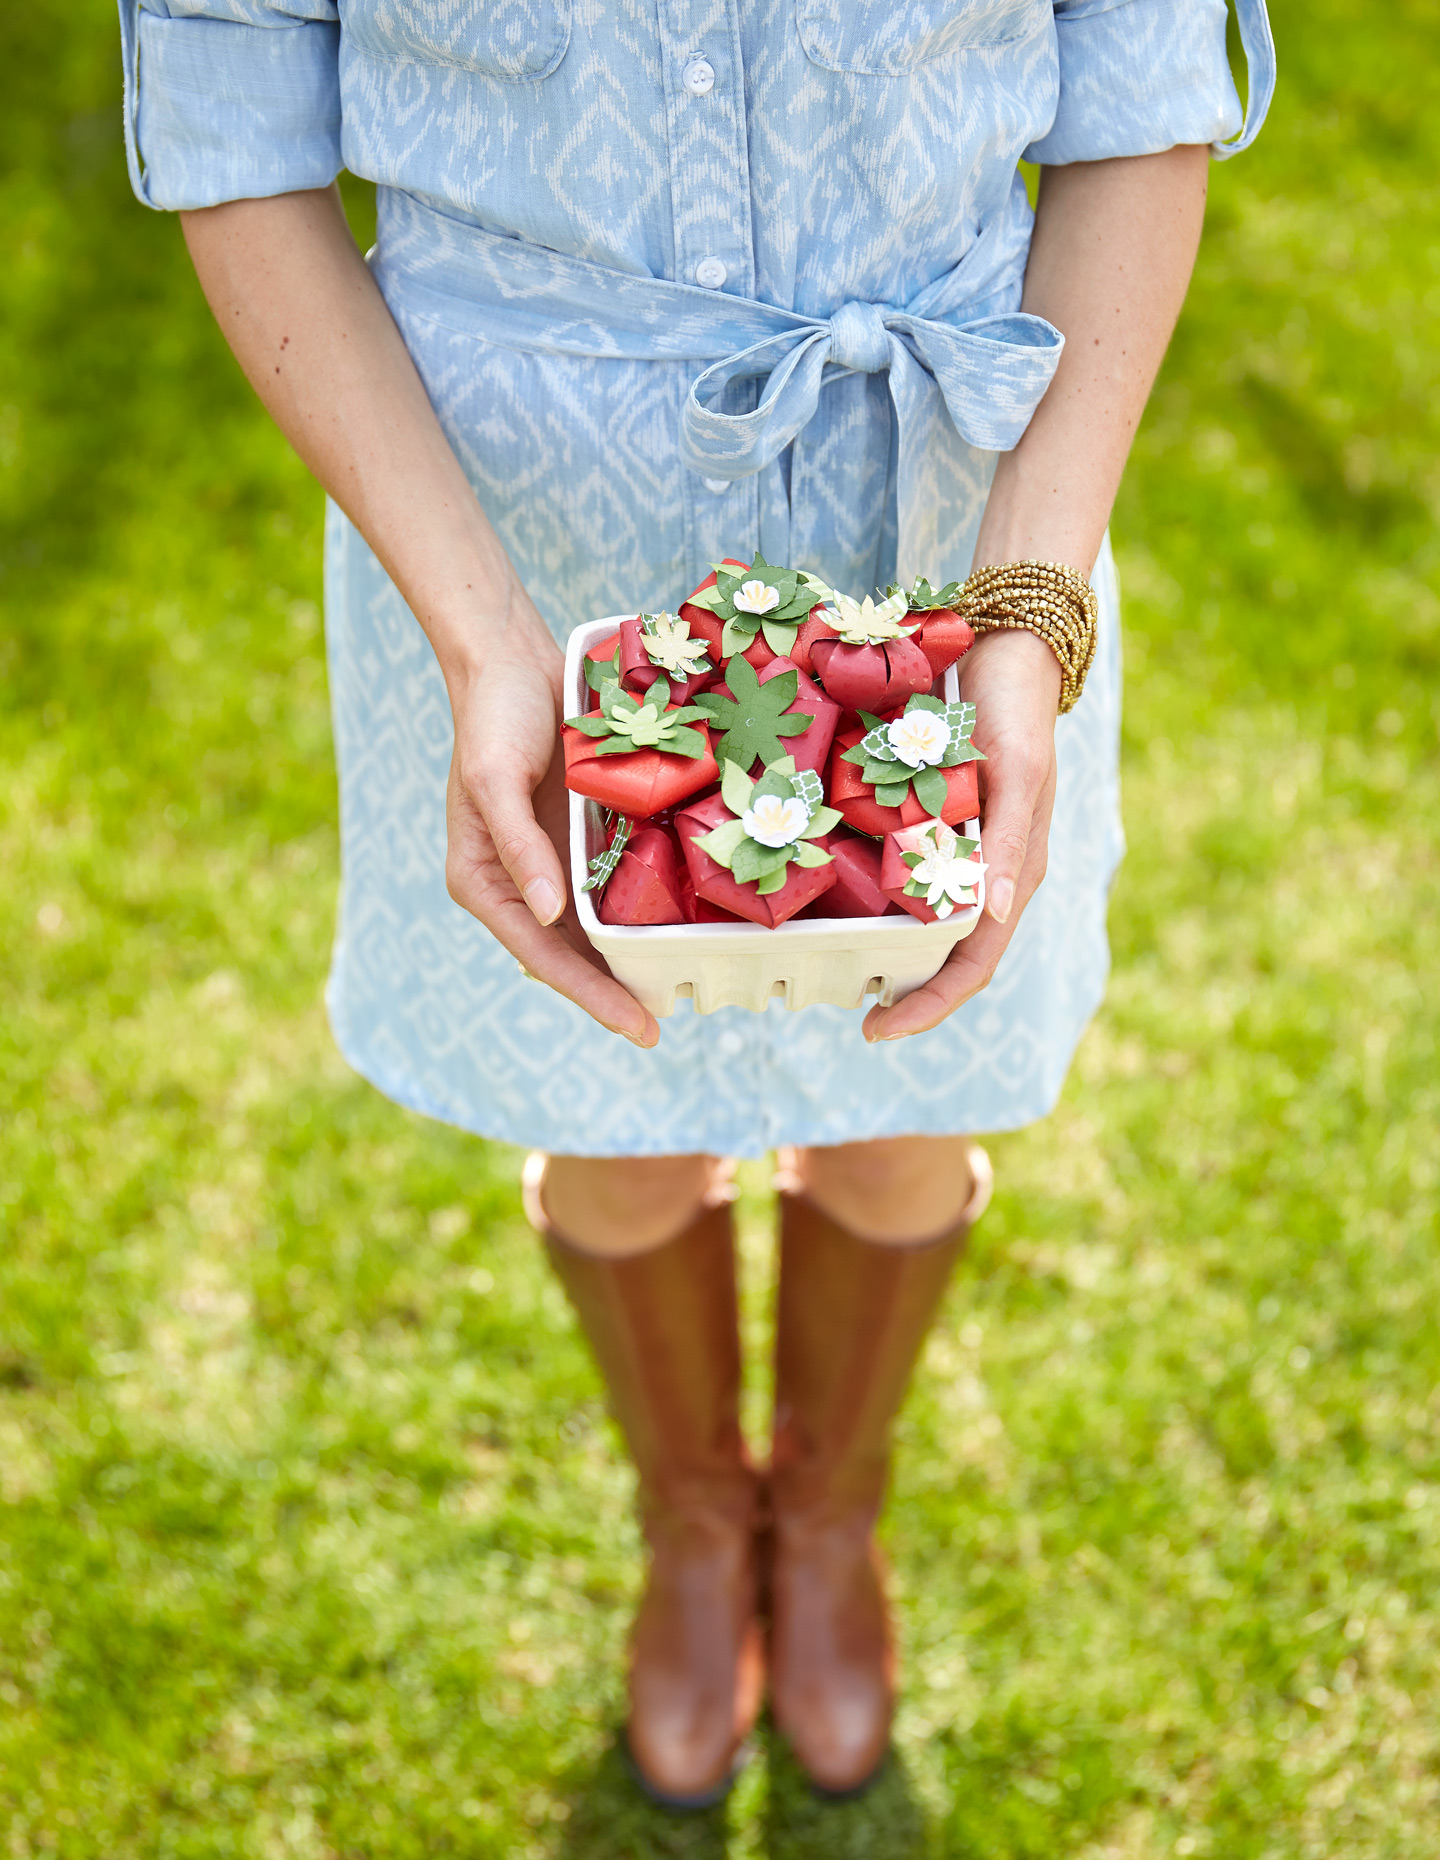 Lifestyle photography Derek Israelsen Strawberries Boots